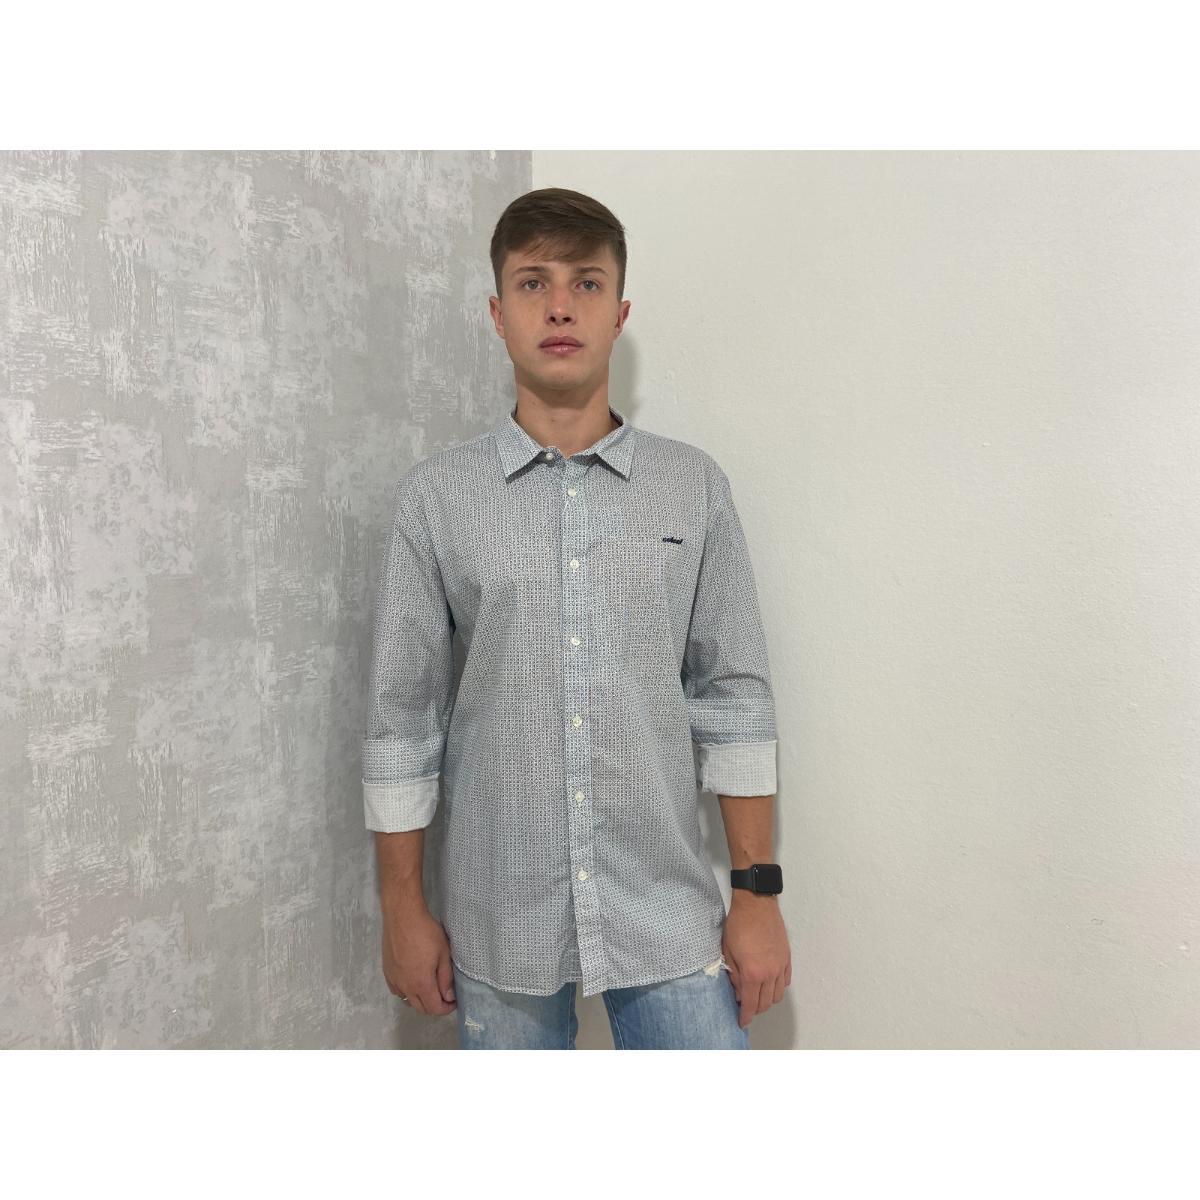 Camisa Masculina Colcci 310103450 Vc107 Off White/marinho